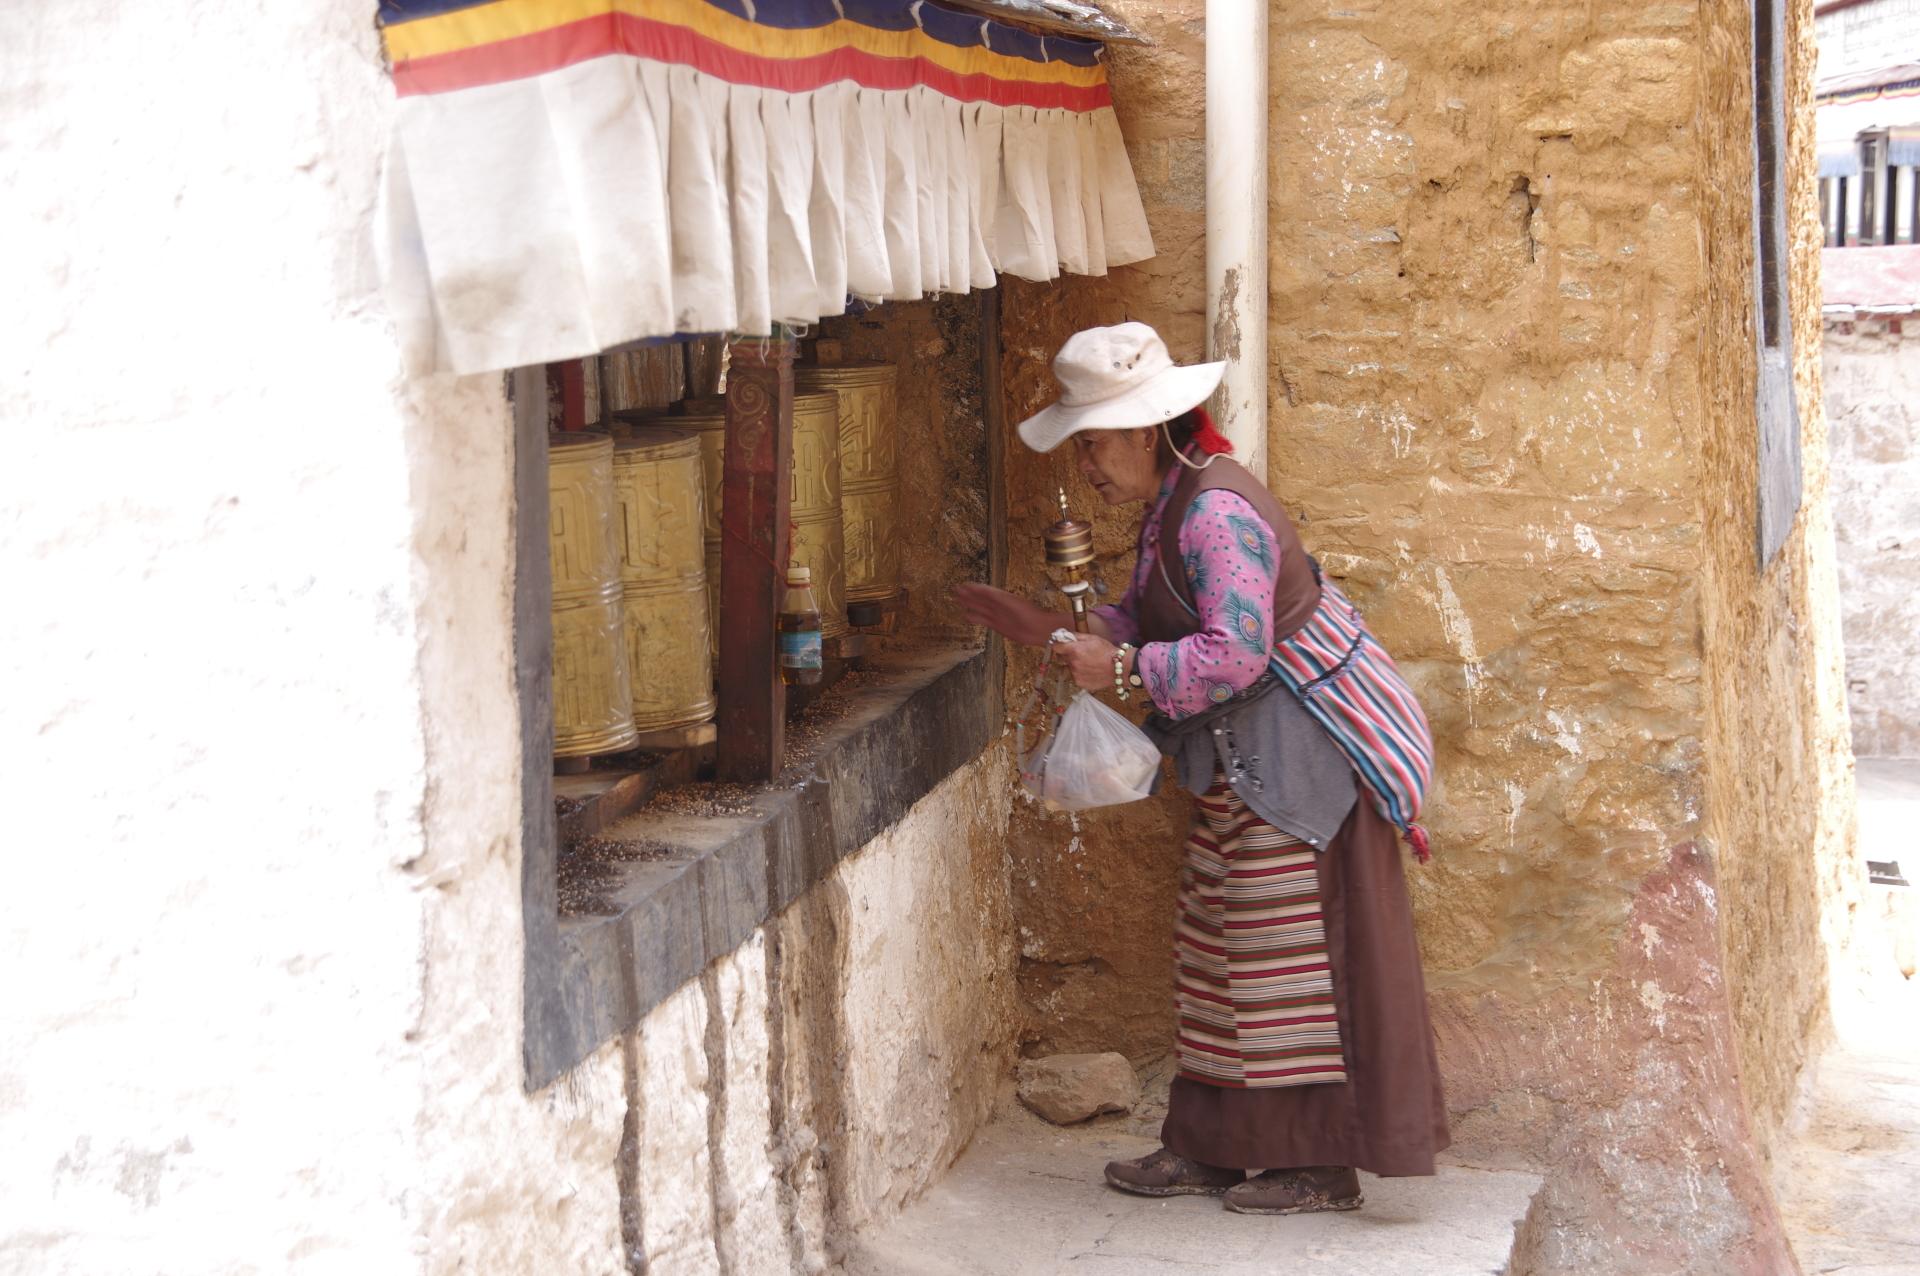 Lhasa Extension